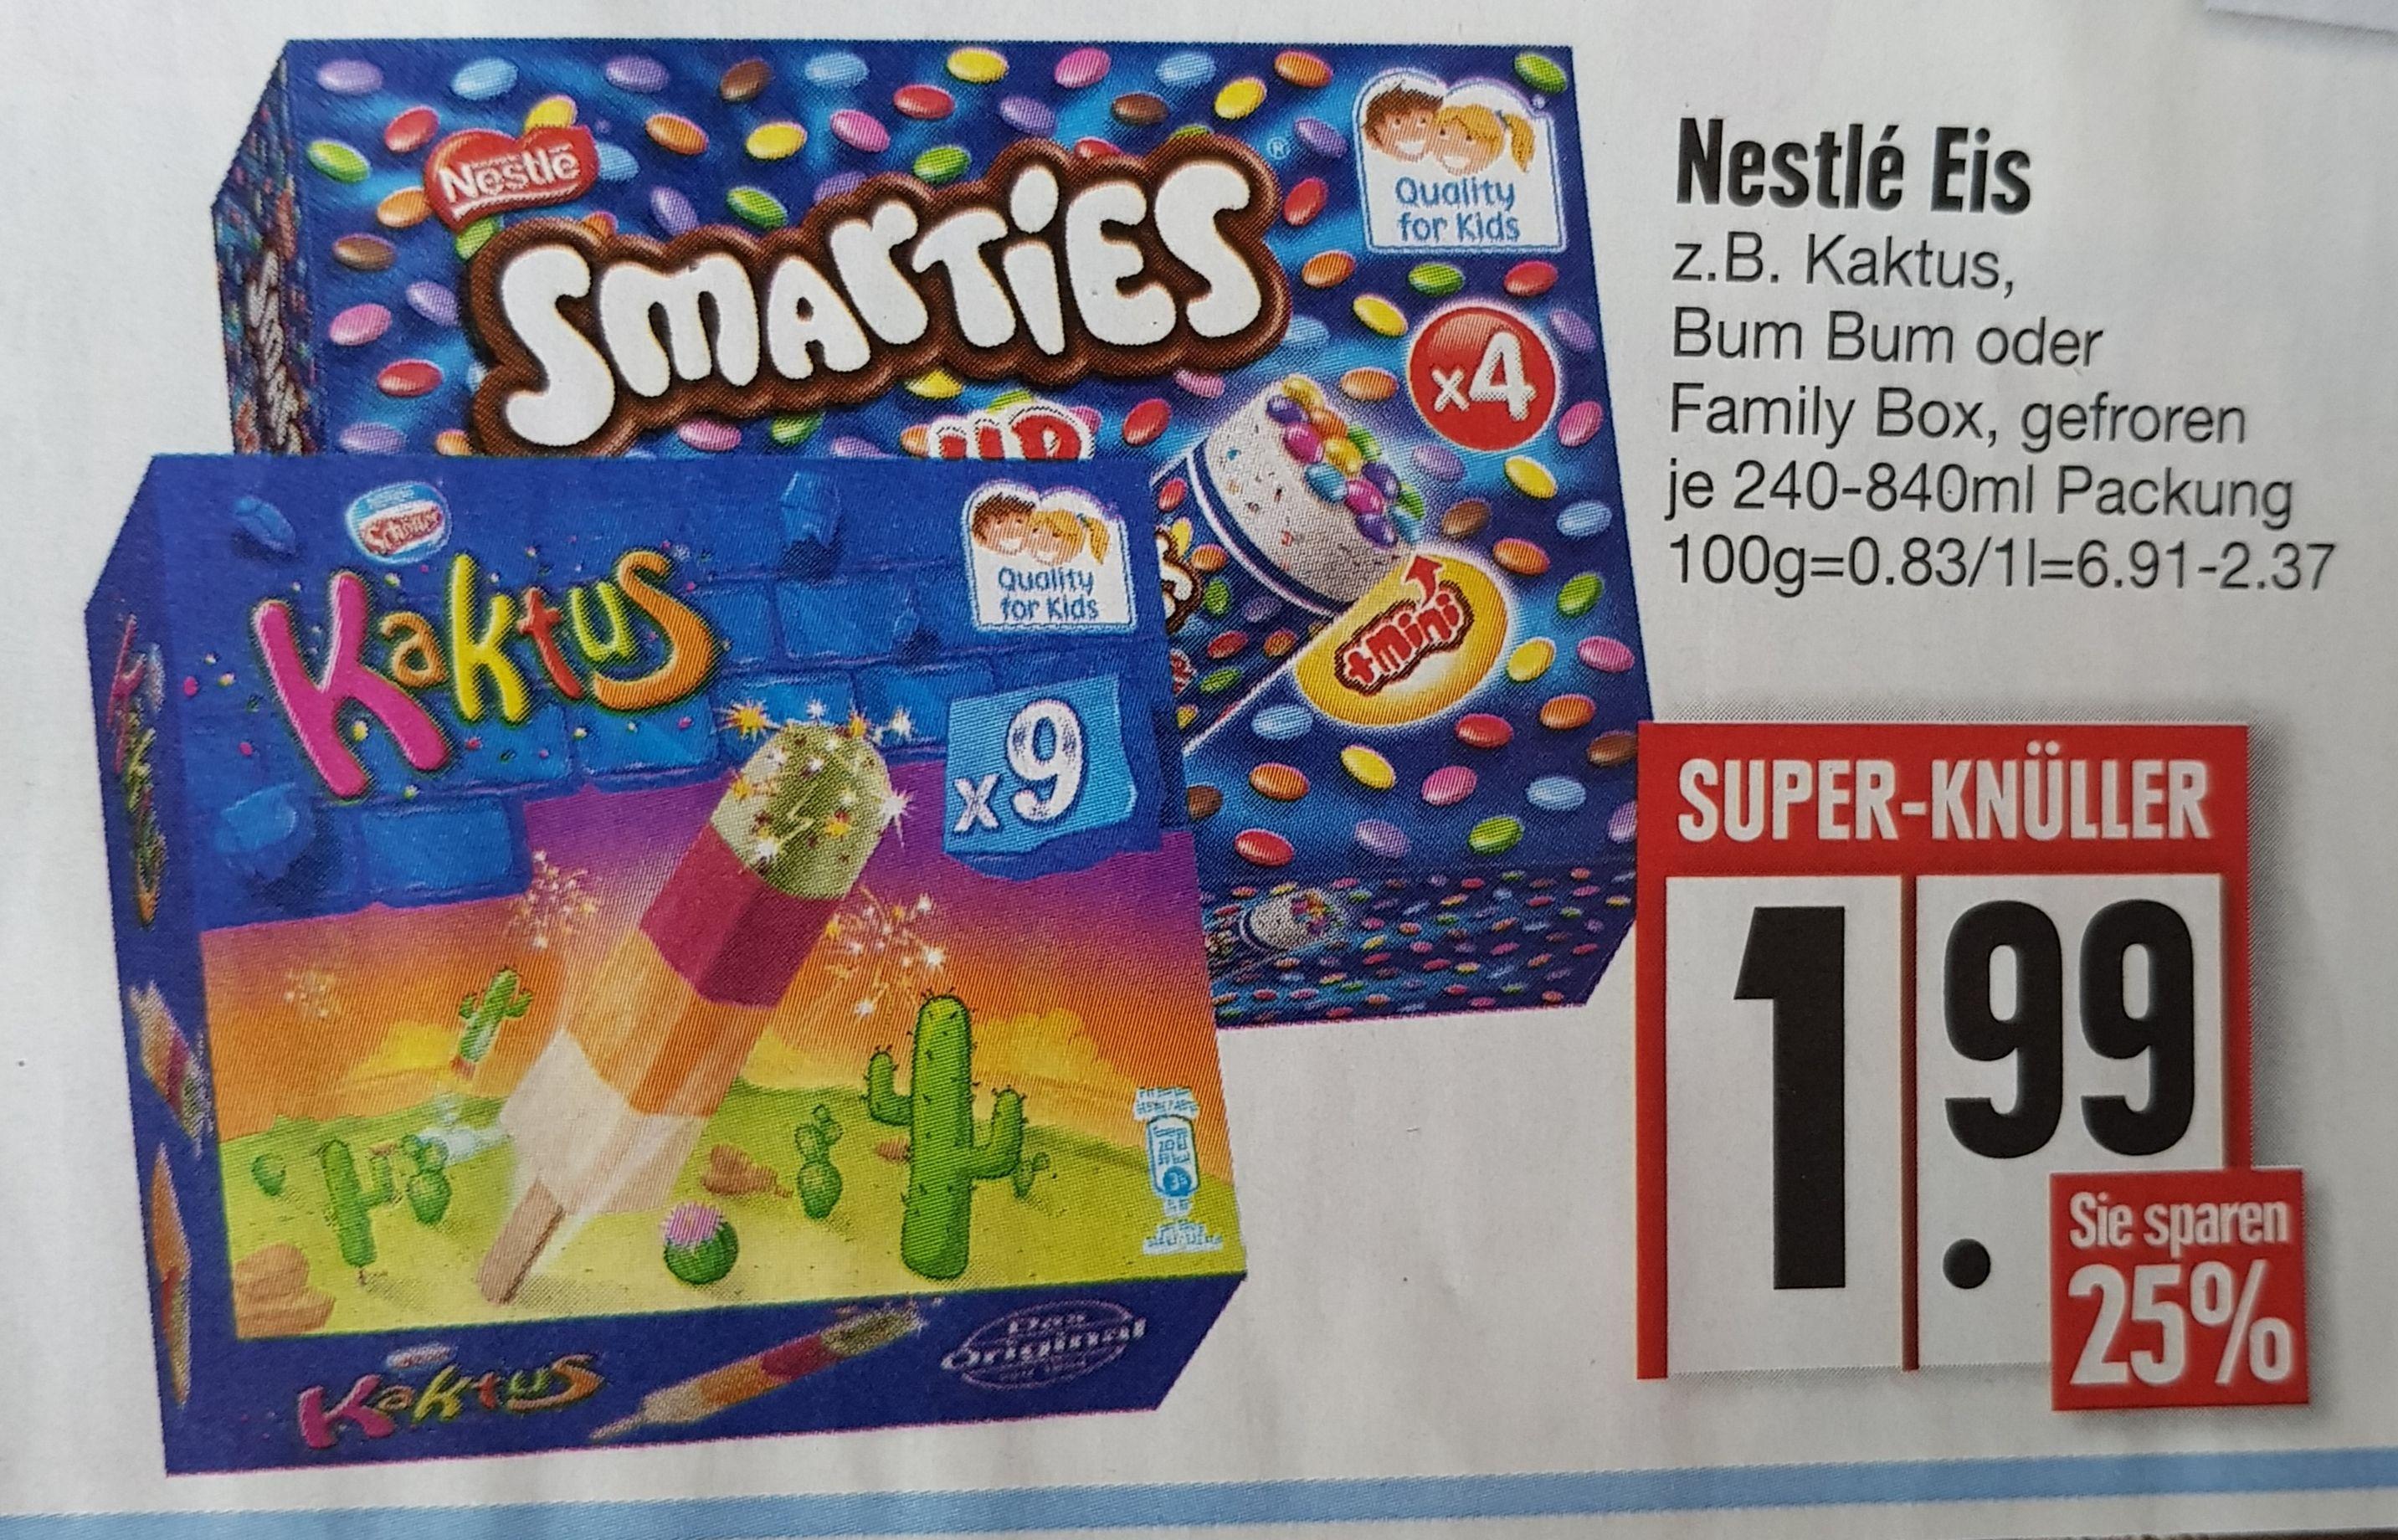 [Edeka] Nestlé Eis für 1,99€ Kaktus/Bum Bum/Family Box